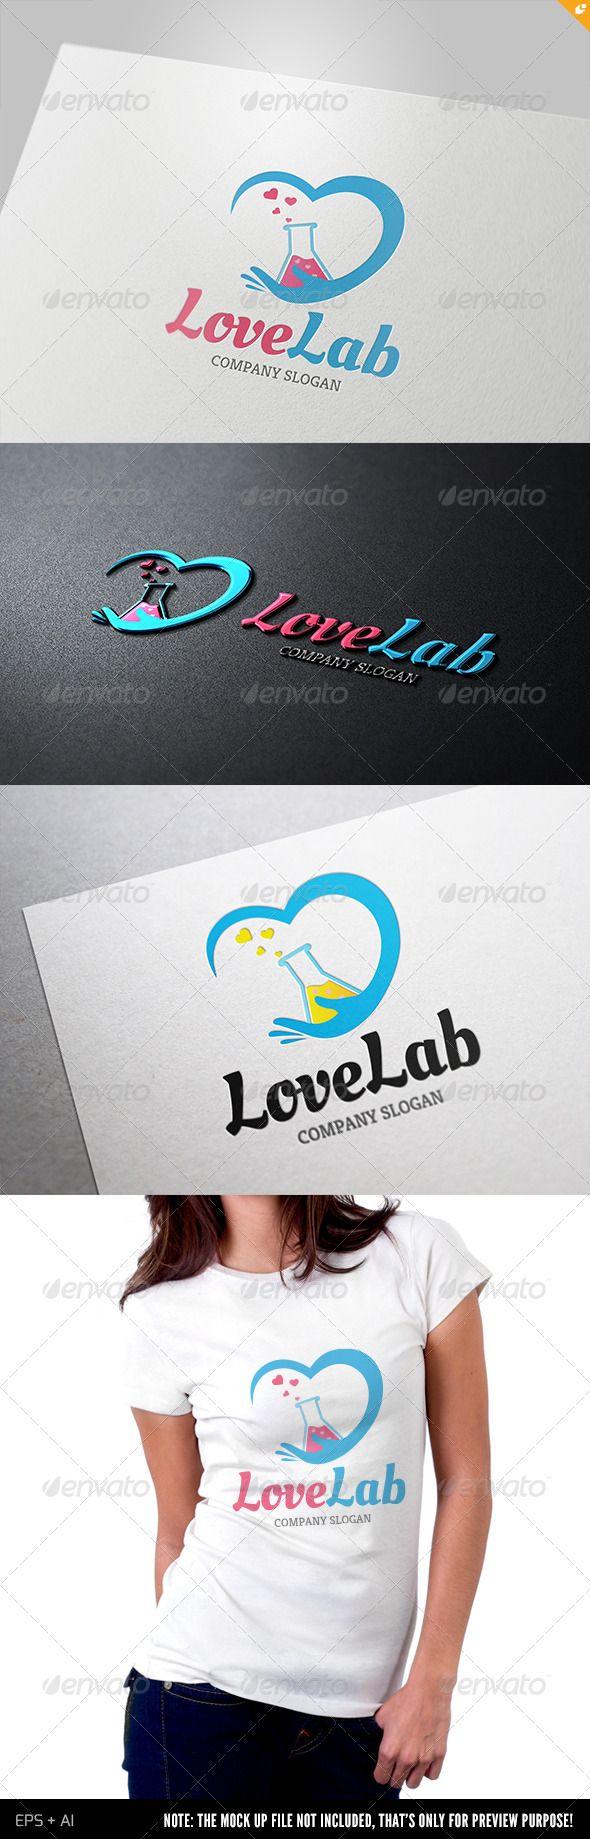 Love Lab Logo - GraphicRiver Item for Sale